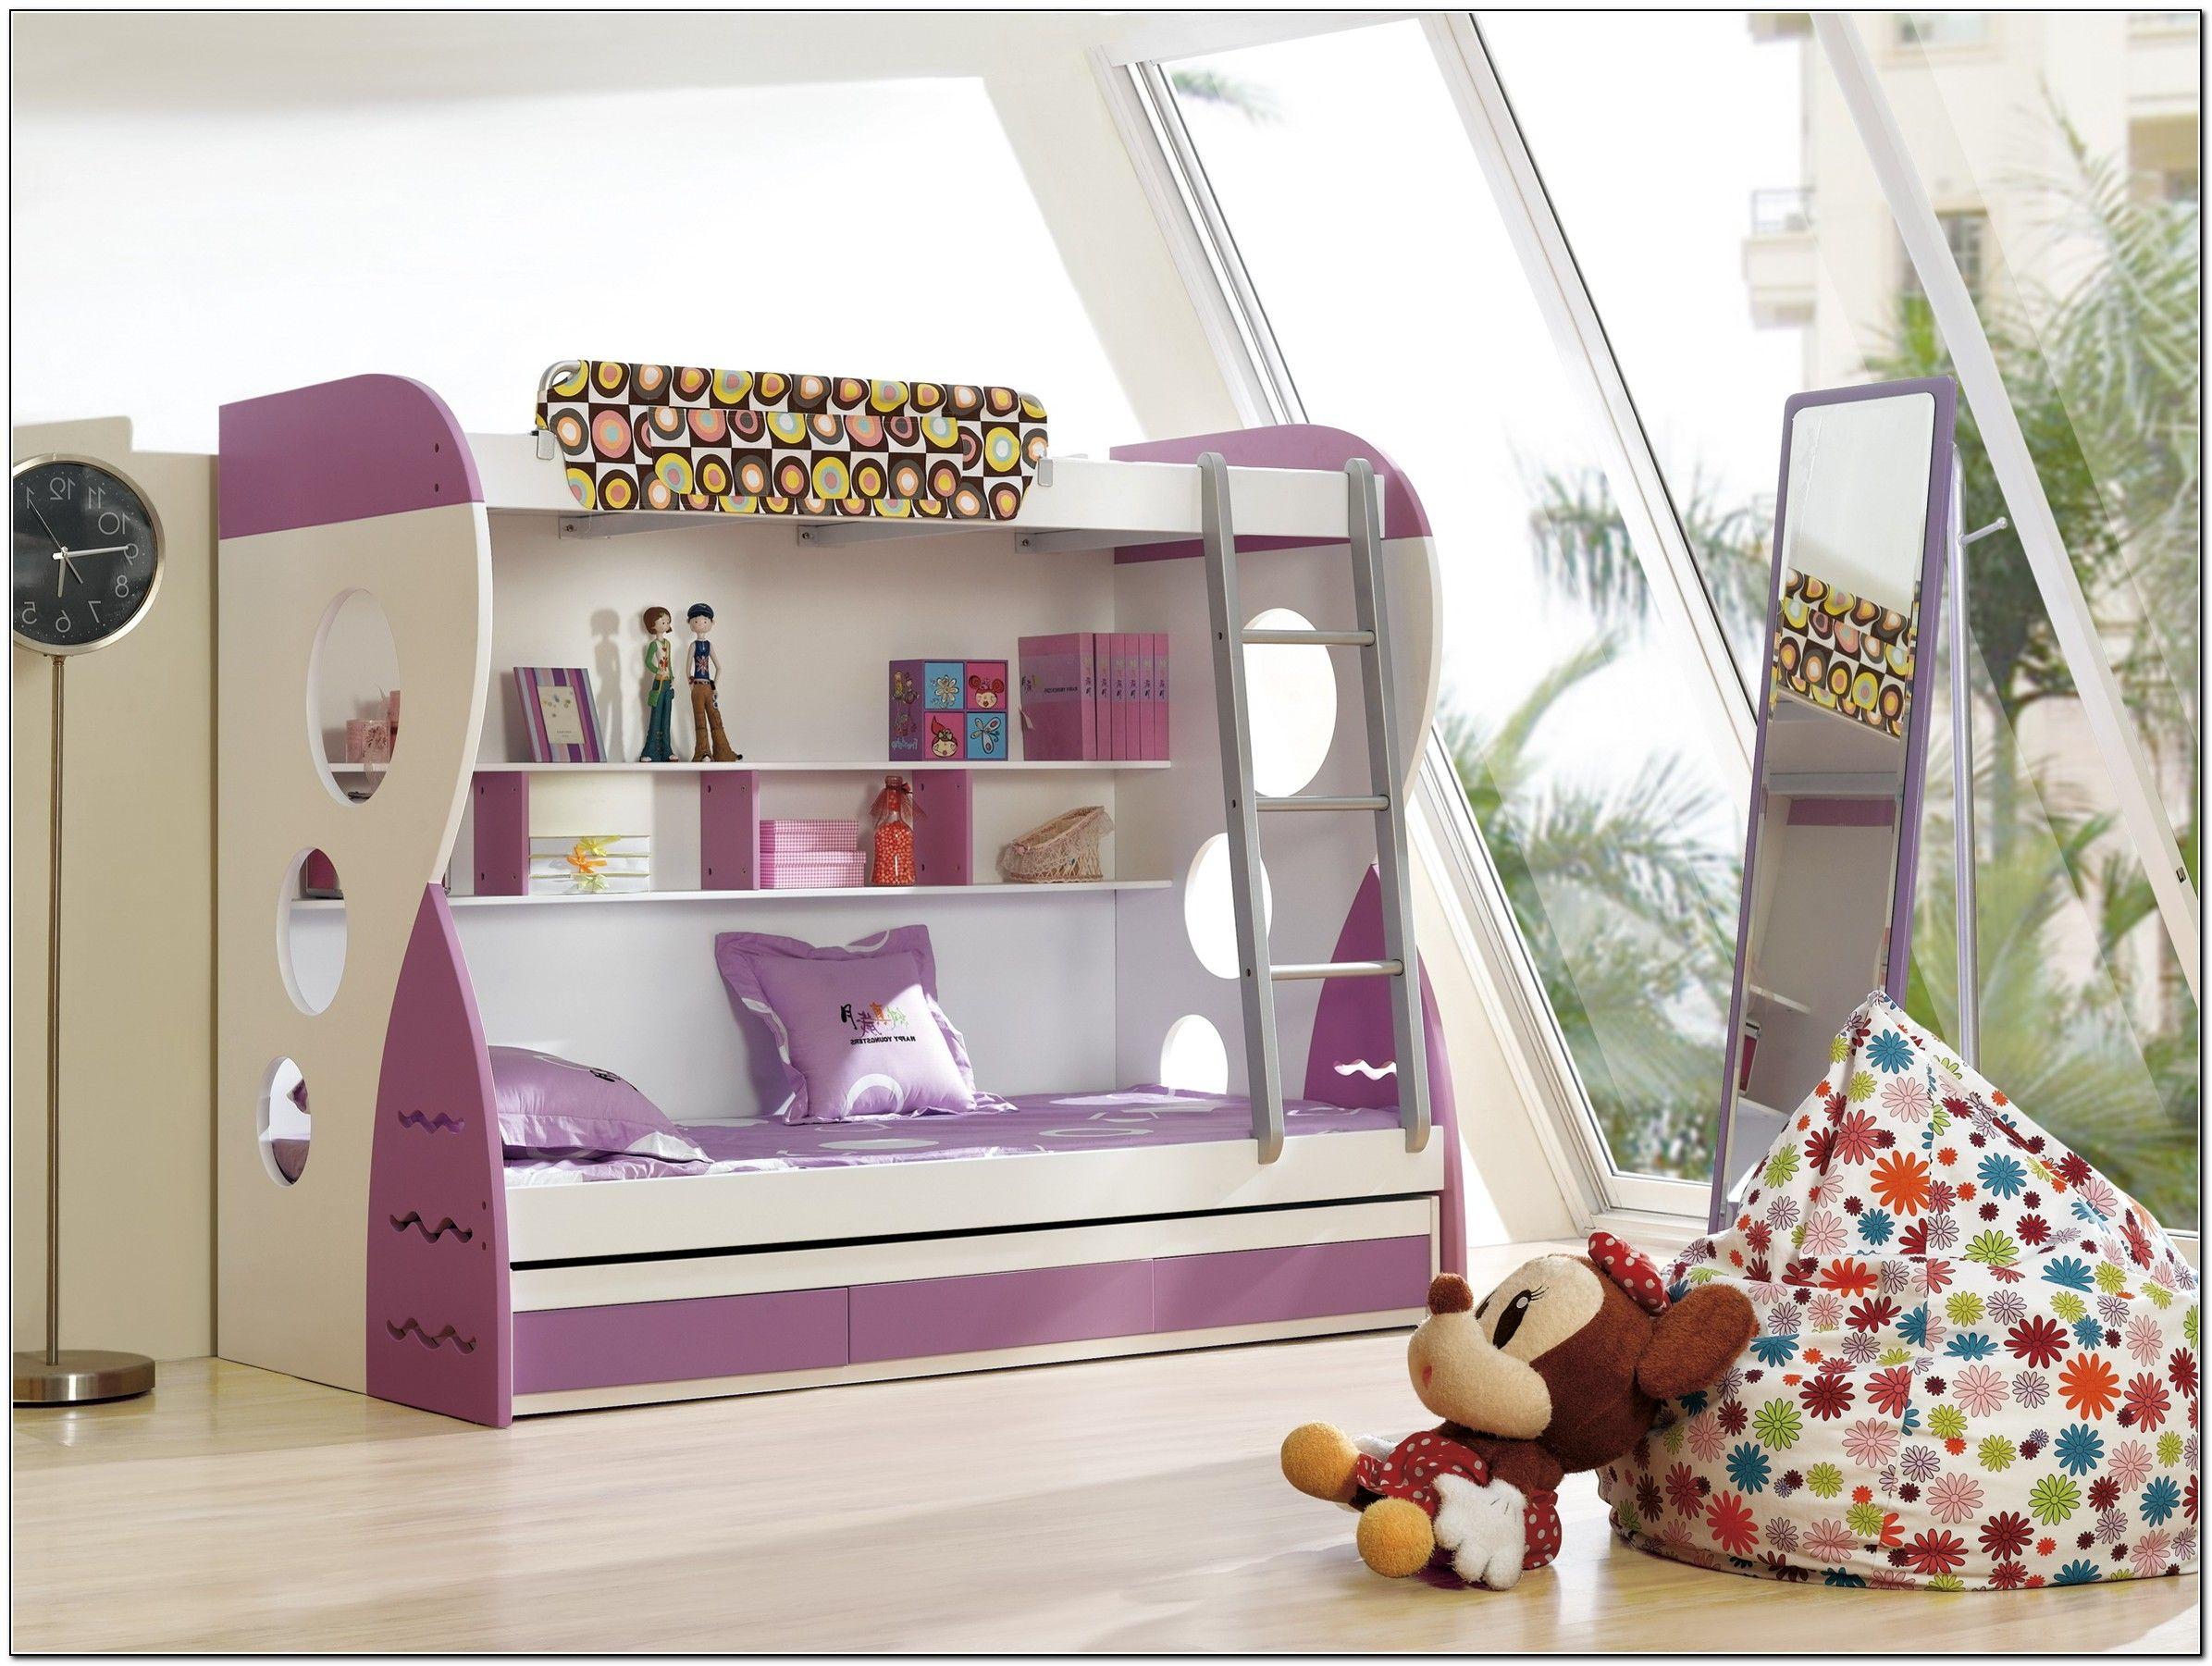 Enchanting girl bedroom design with cozy loft beds for teens sweet purple loft beds for